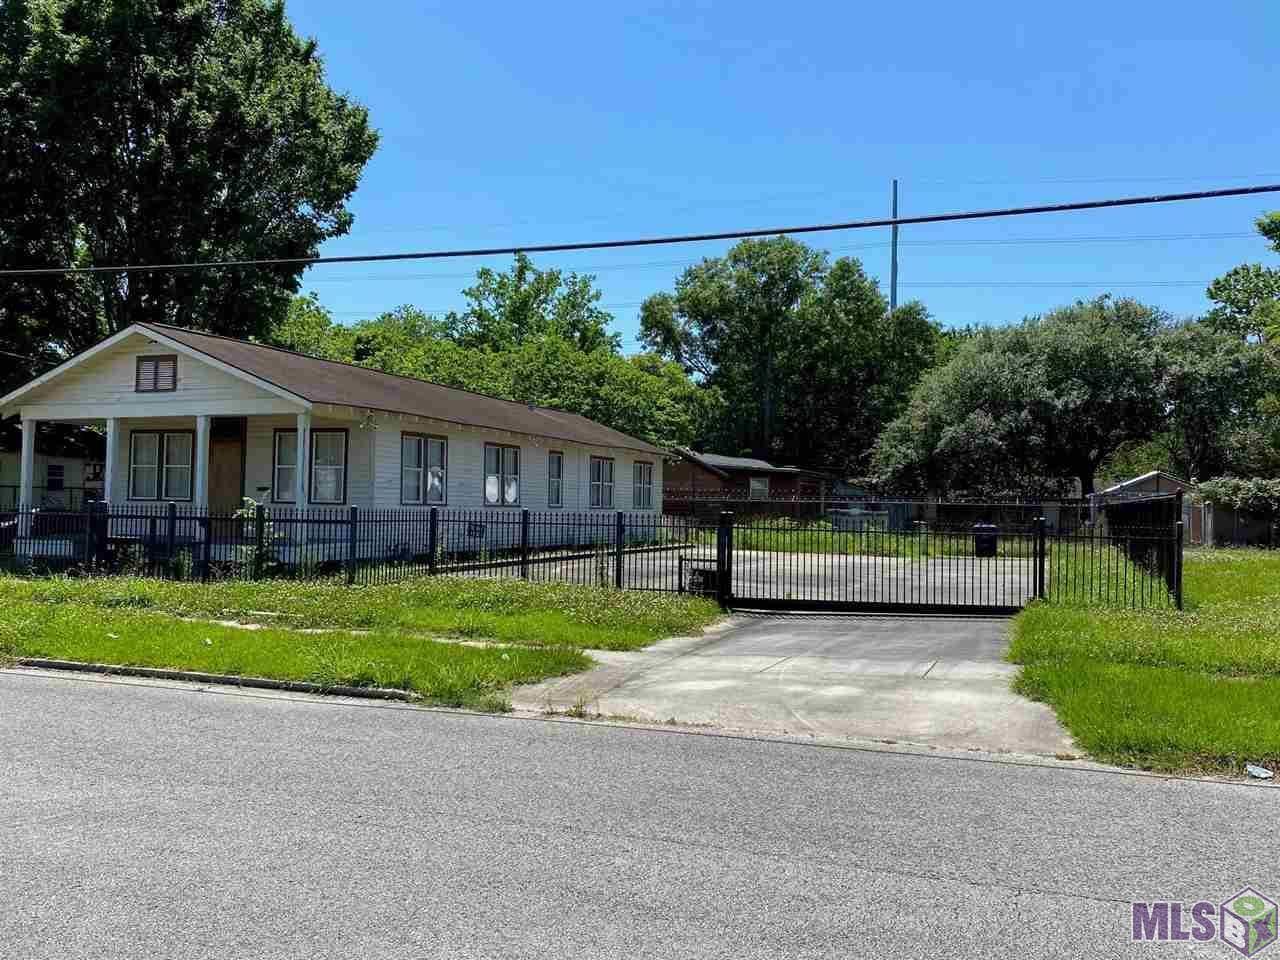 724 S 15TH ST, Baton Rouge, LA 70820 - MLS#: 2021014943